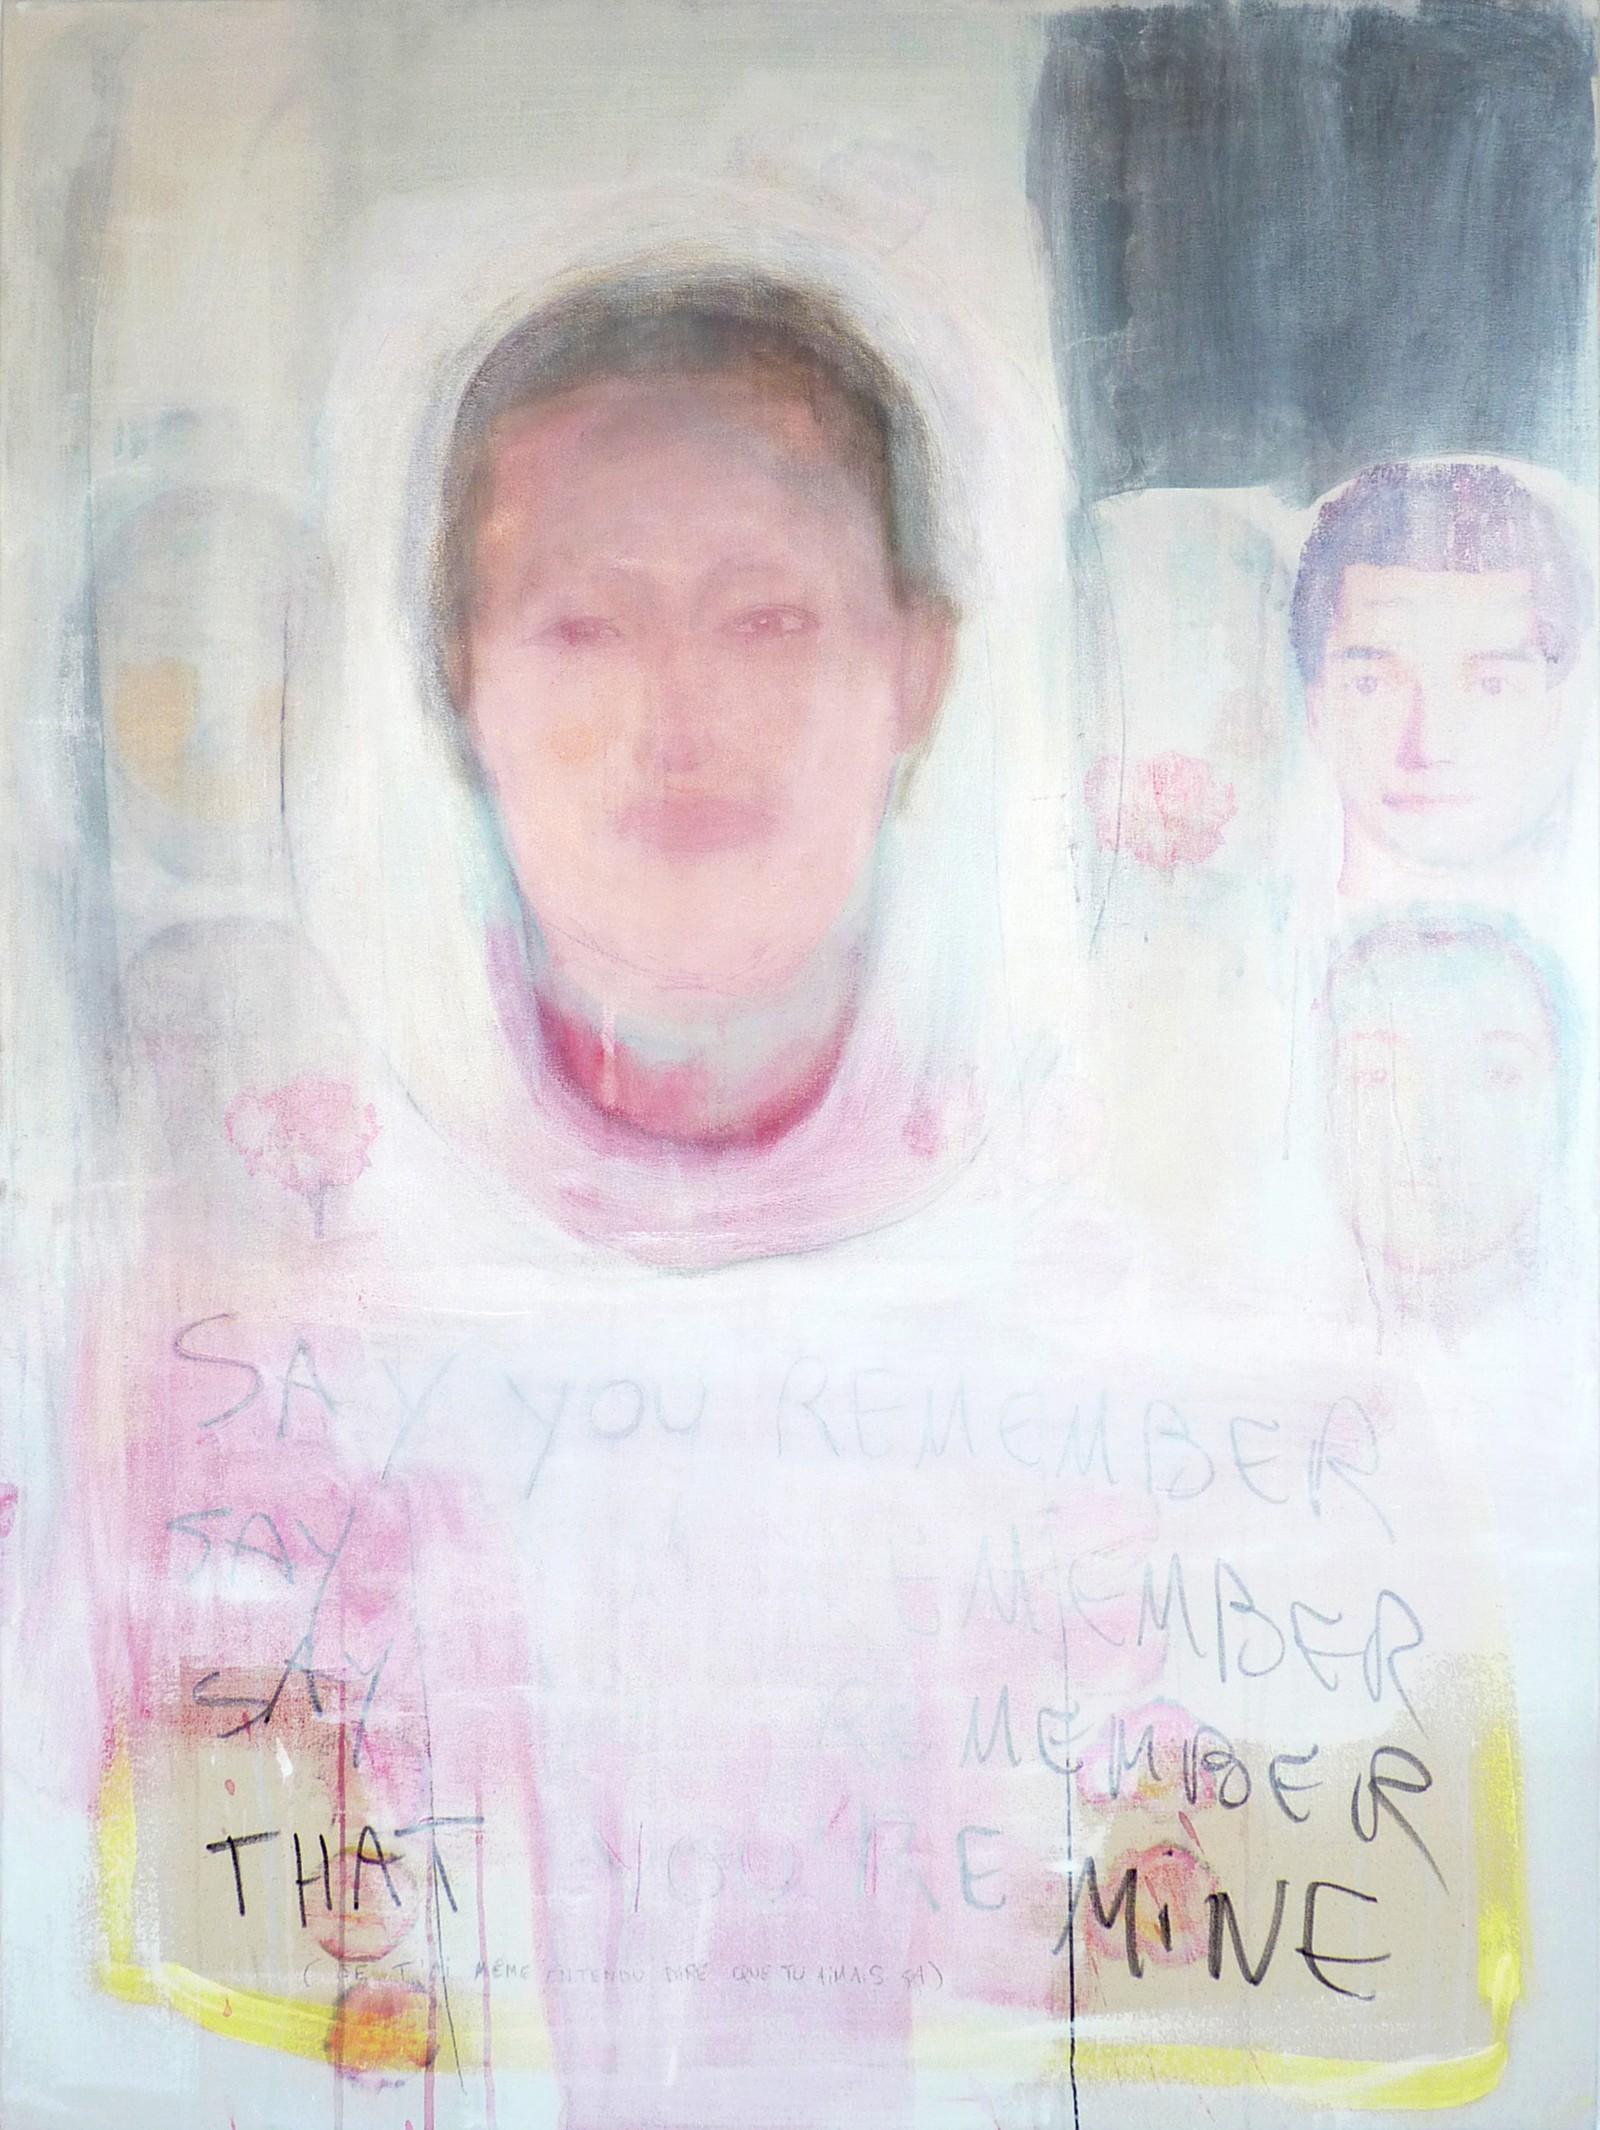 Charles Michels, 130 x 97 cm, 17:05:2015